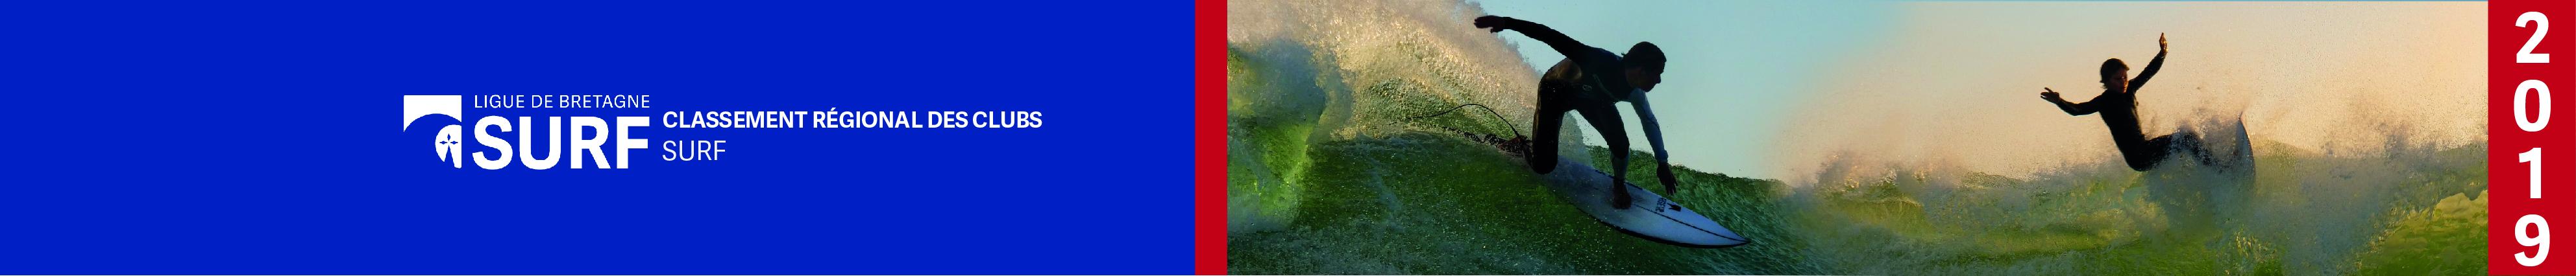 https://www.ligue-bretagne-surf.bzh/wp-content/uploads/2019/03/Visuel-Classement-Club-Surf.jpg